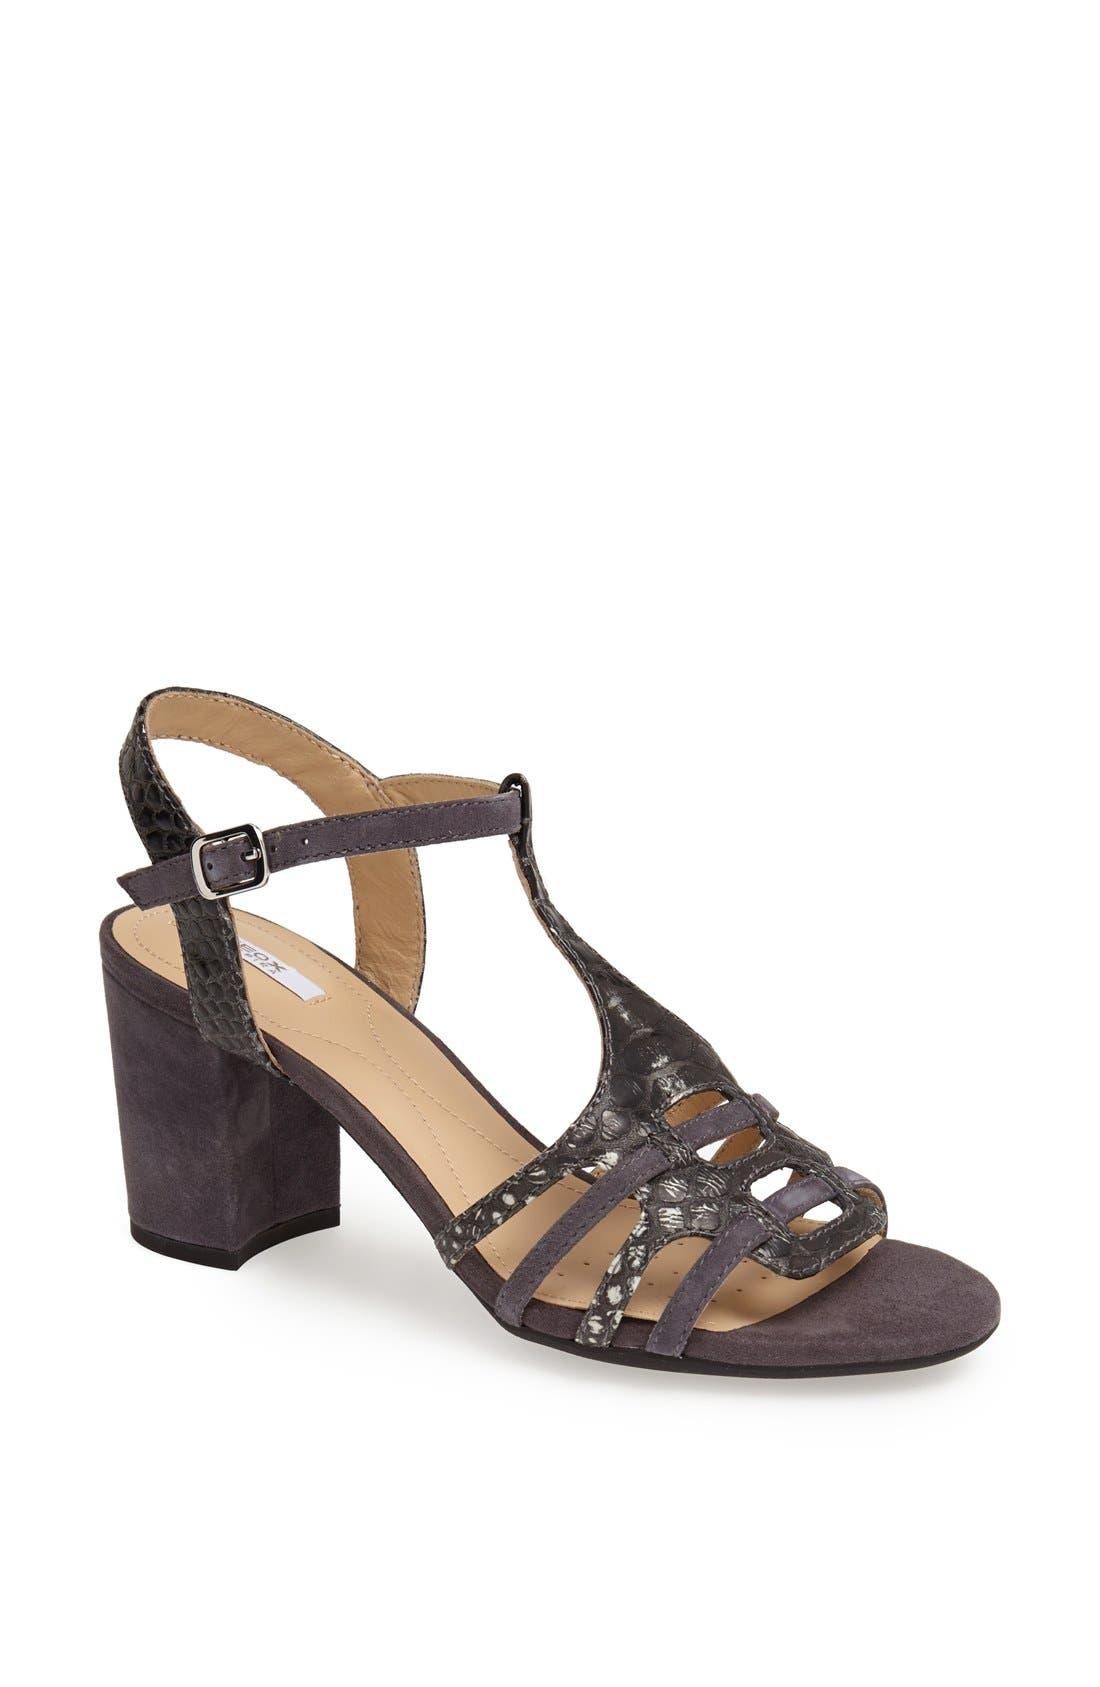 Main Image - Geox 'Nesa' Sandal